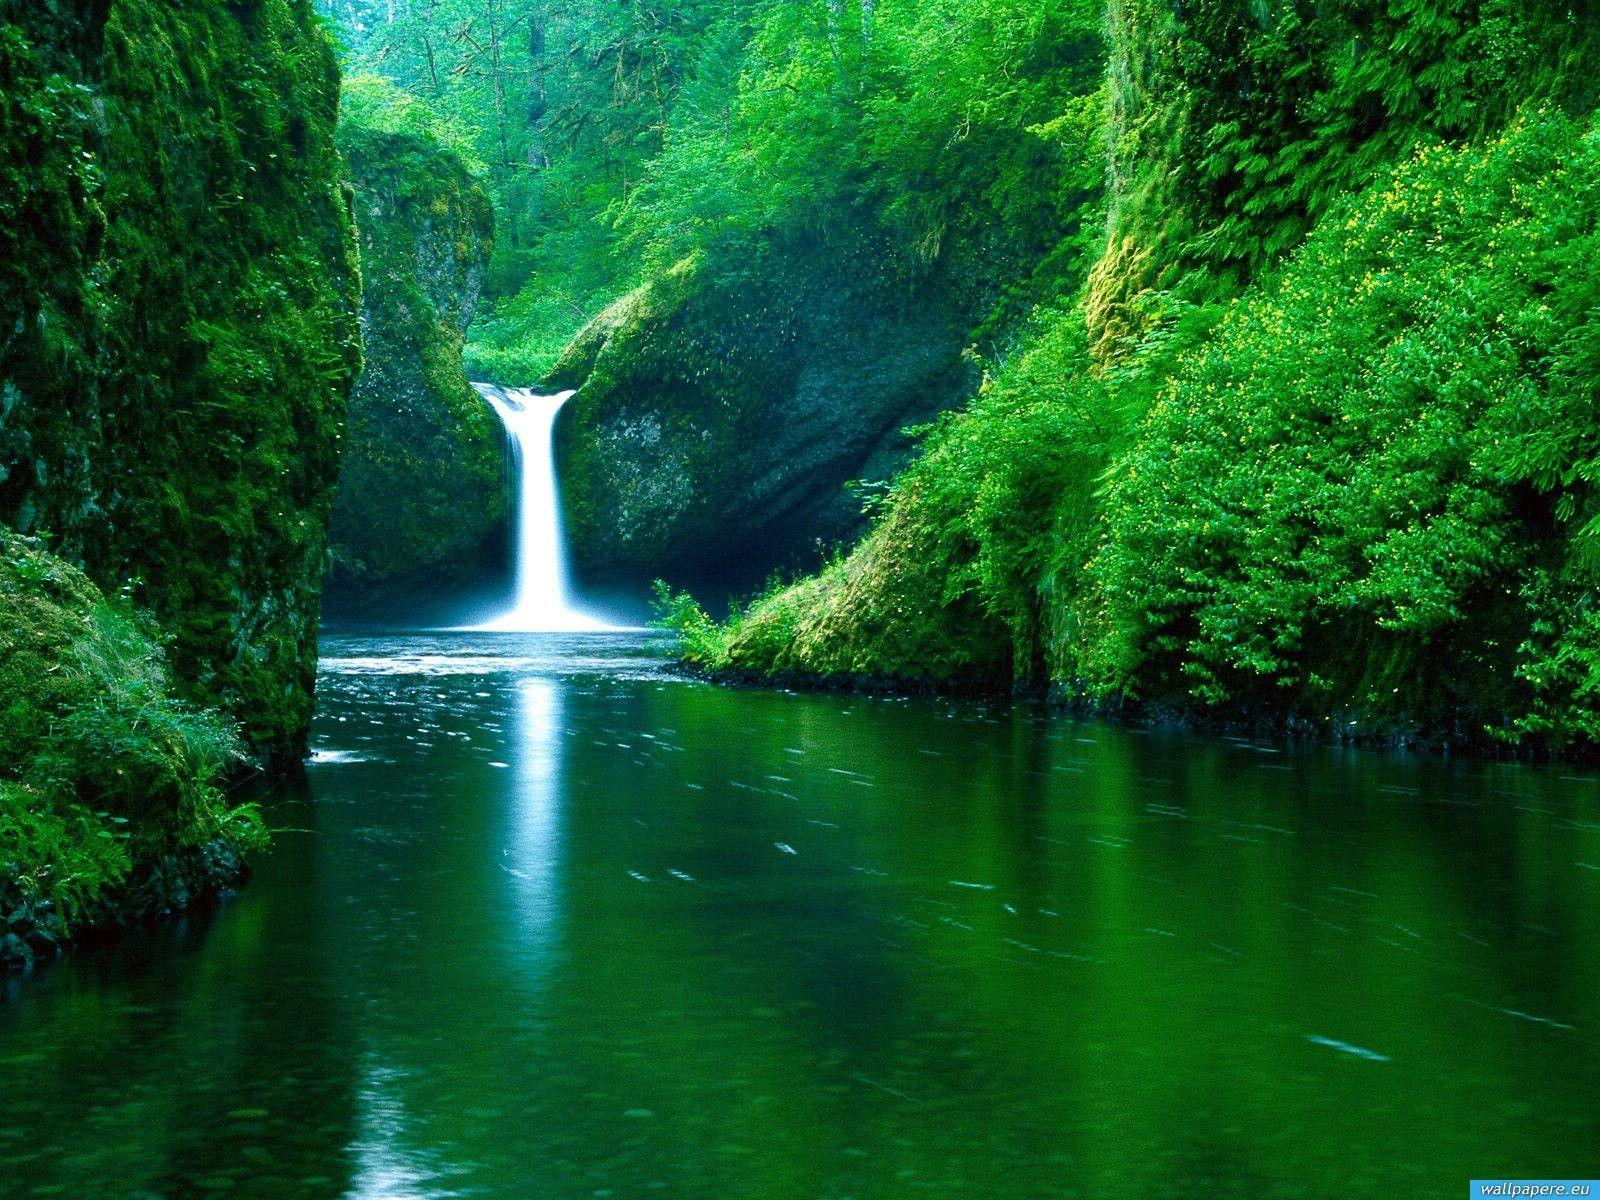 Nature Wallpapers Hd Waterfall Wallpaper Beautiful Nature Punchbowl Falls